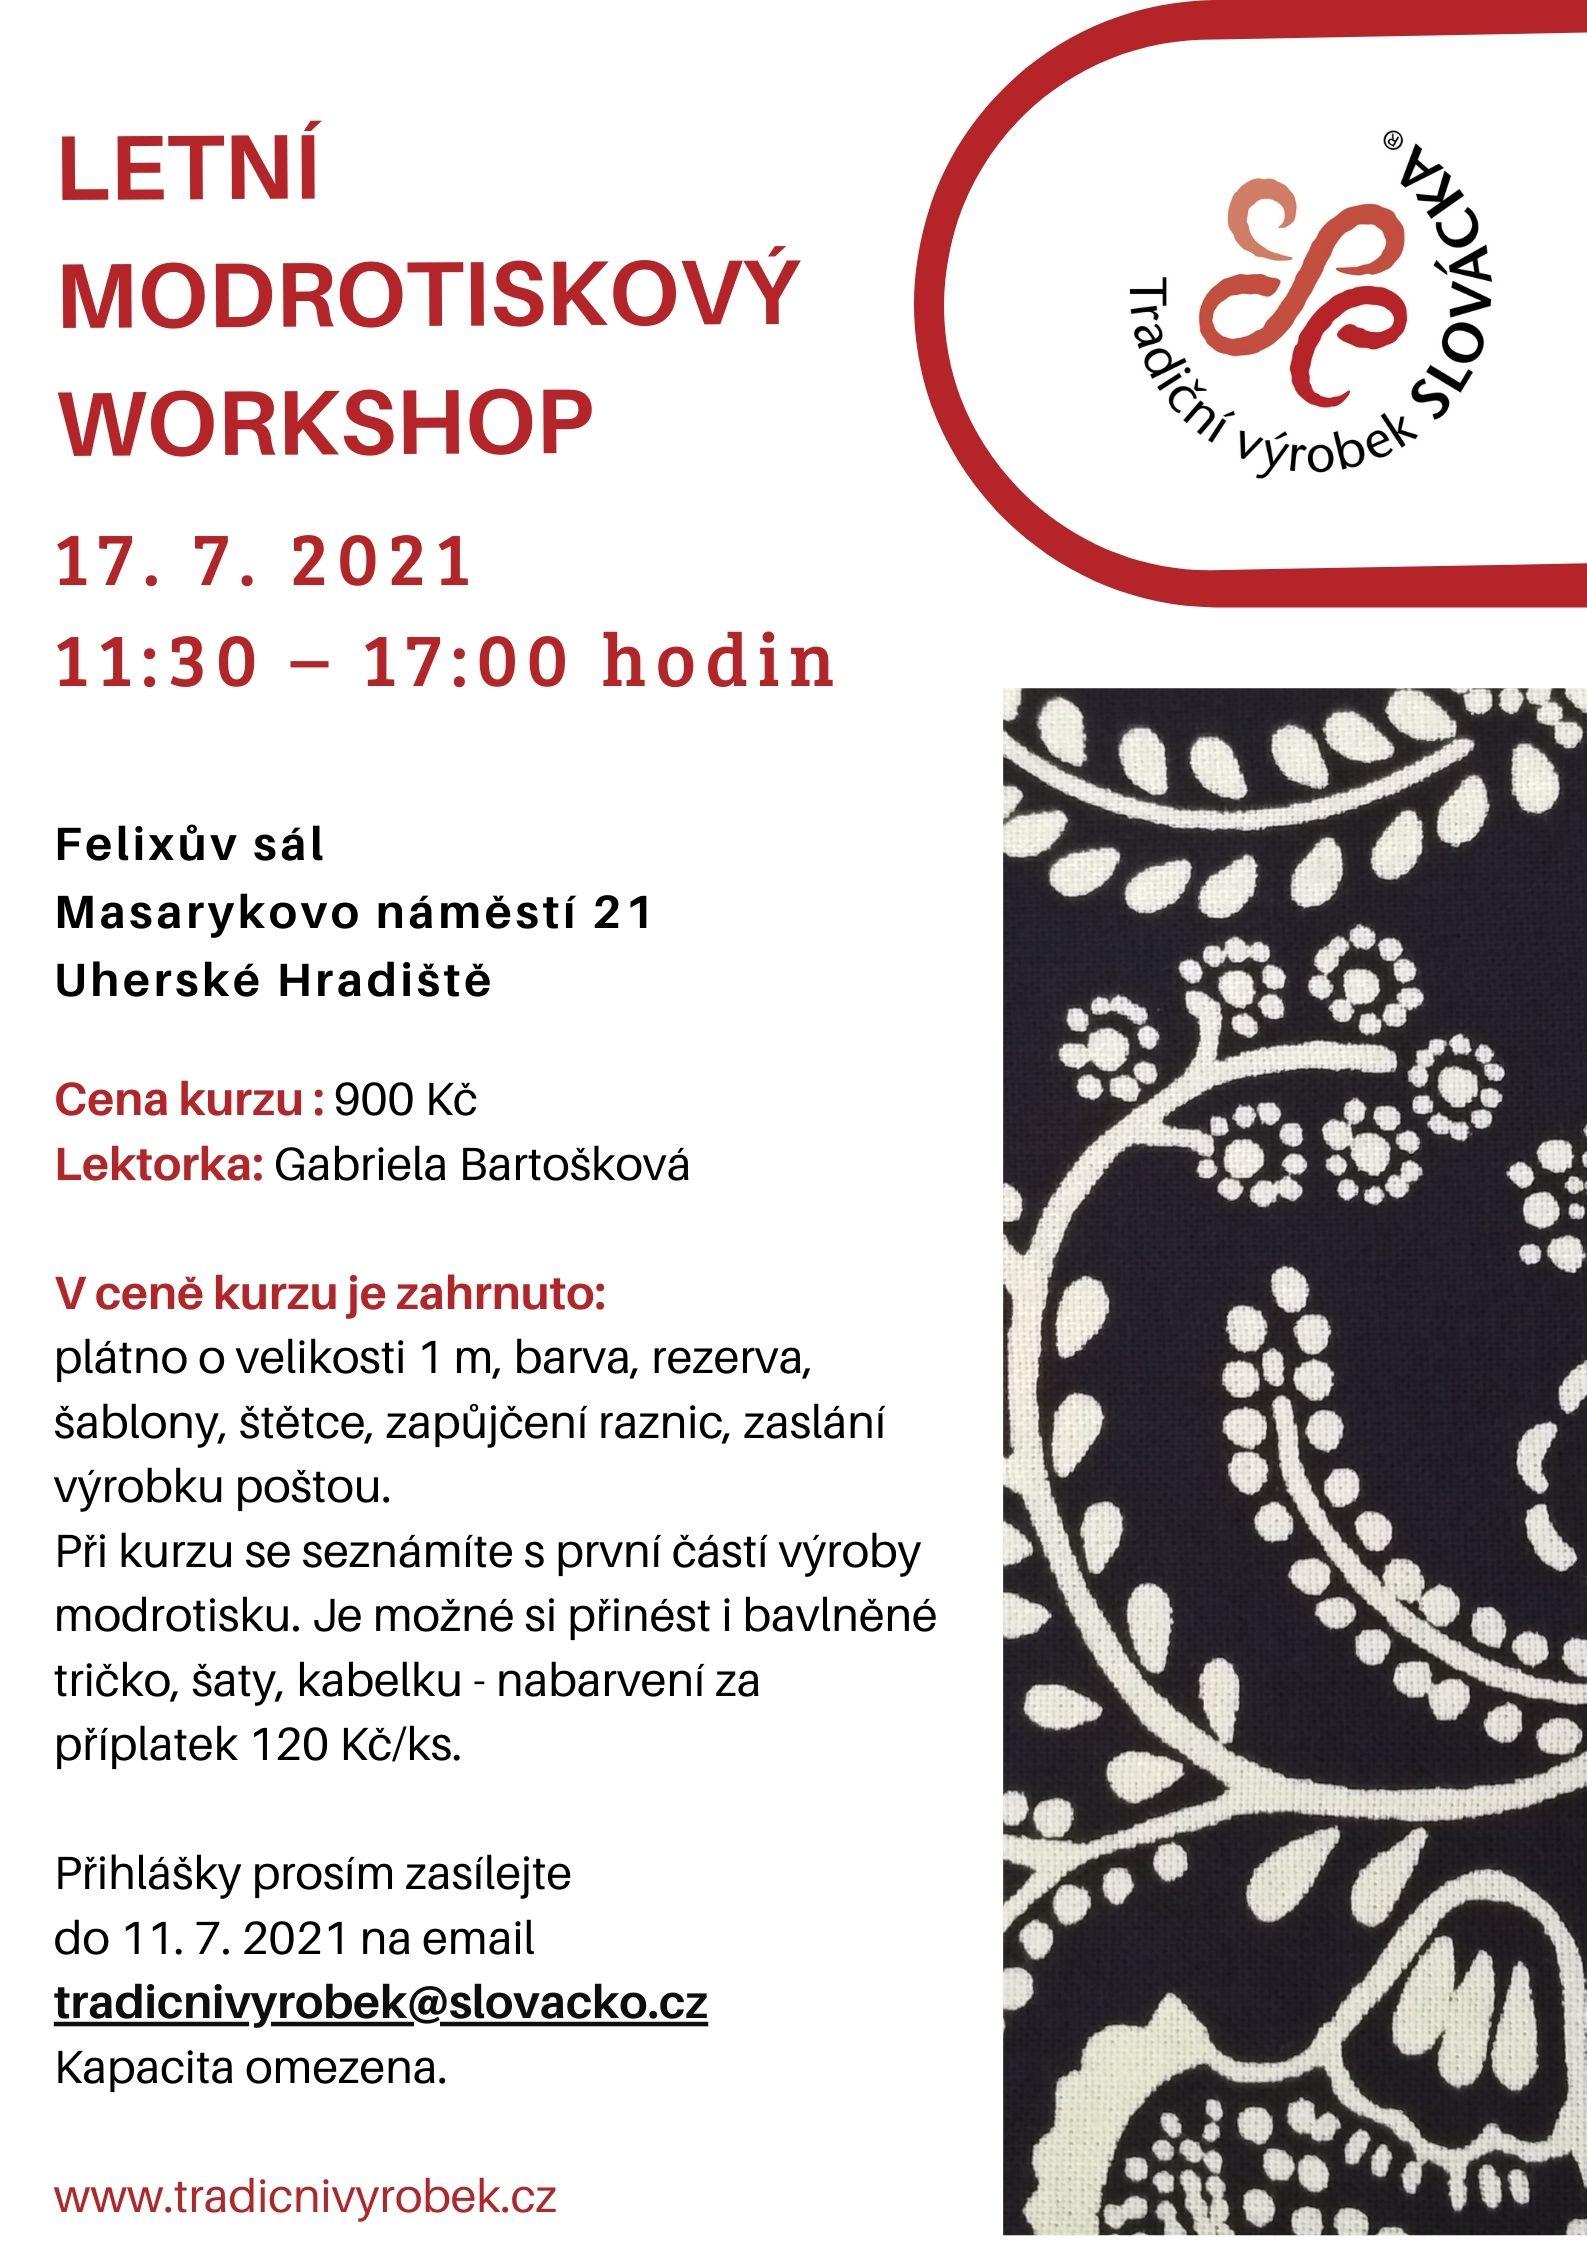 Modrotiskový workshop